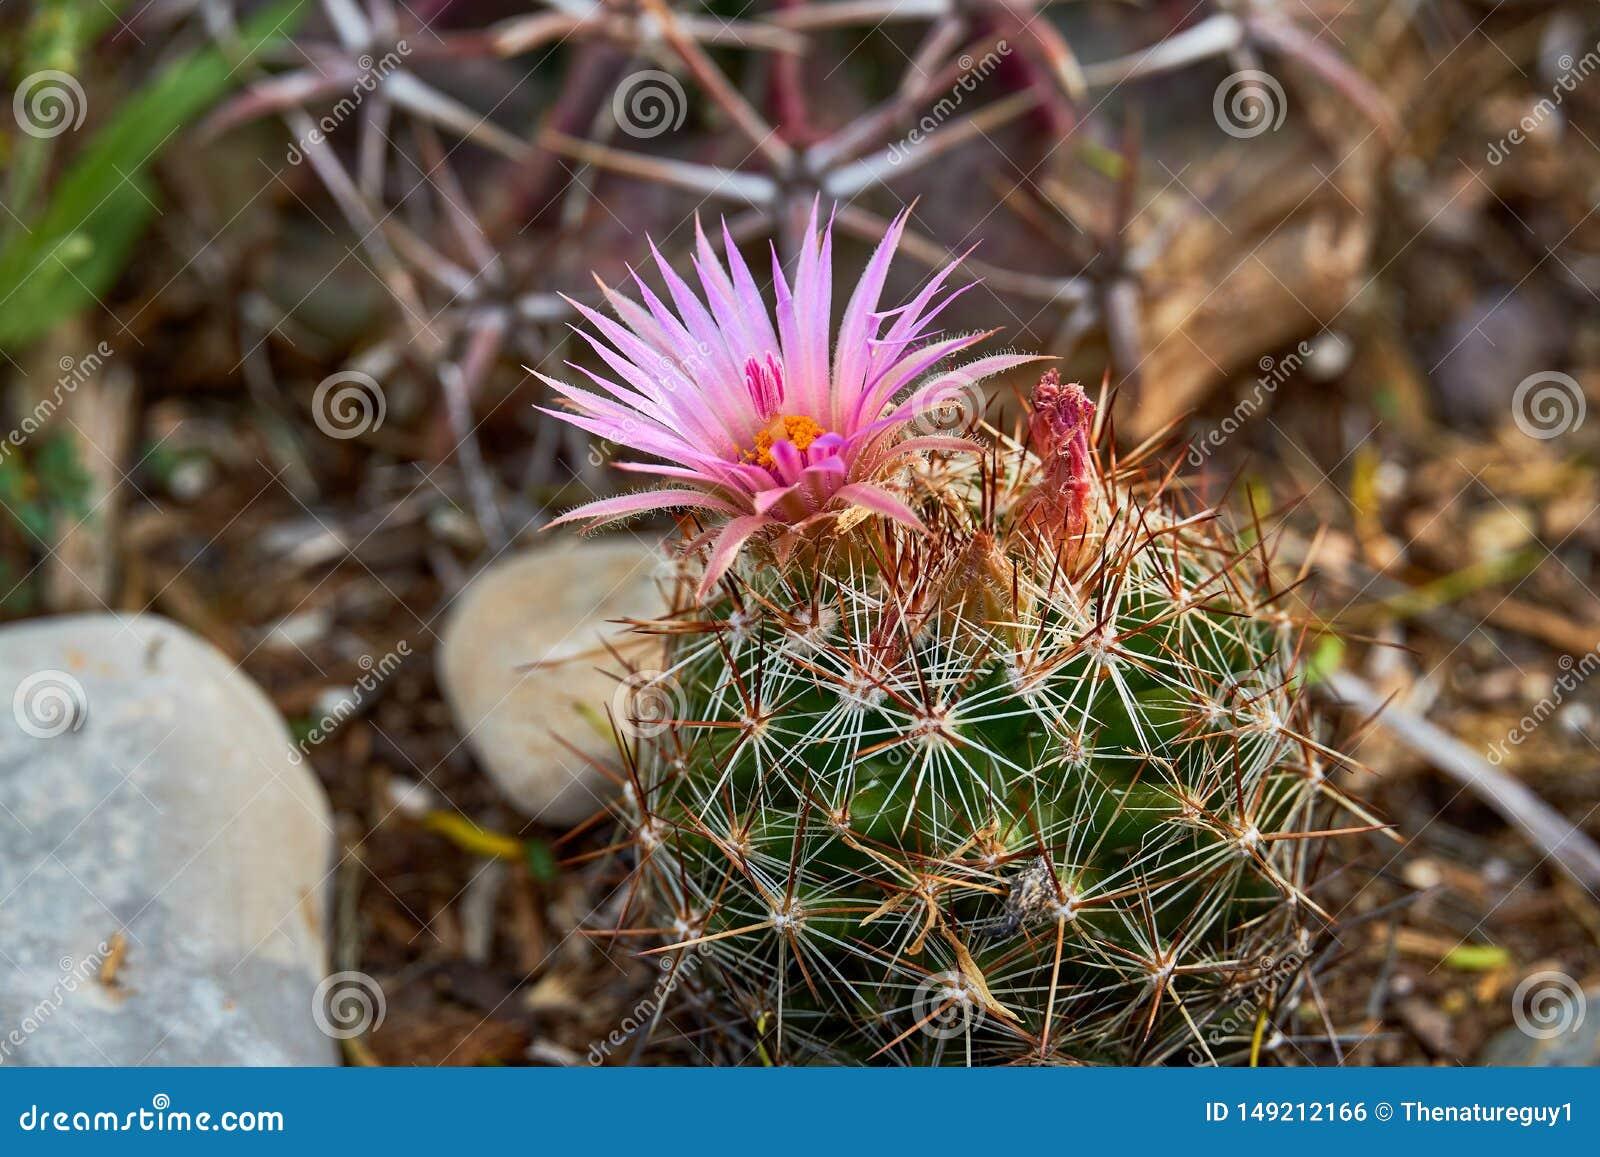 Macro Close up of Vivaparous foxtail cactus Escobaria vivipara . Texas Wildflowers